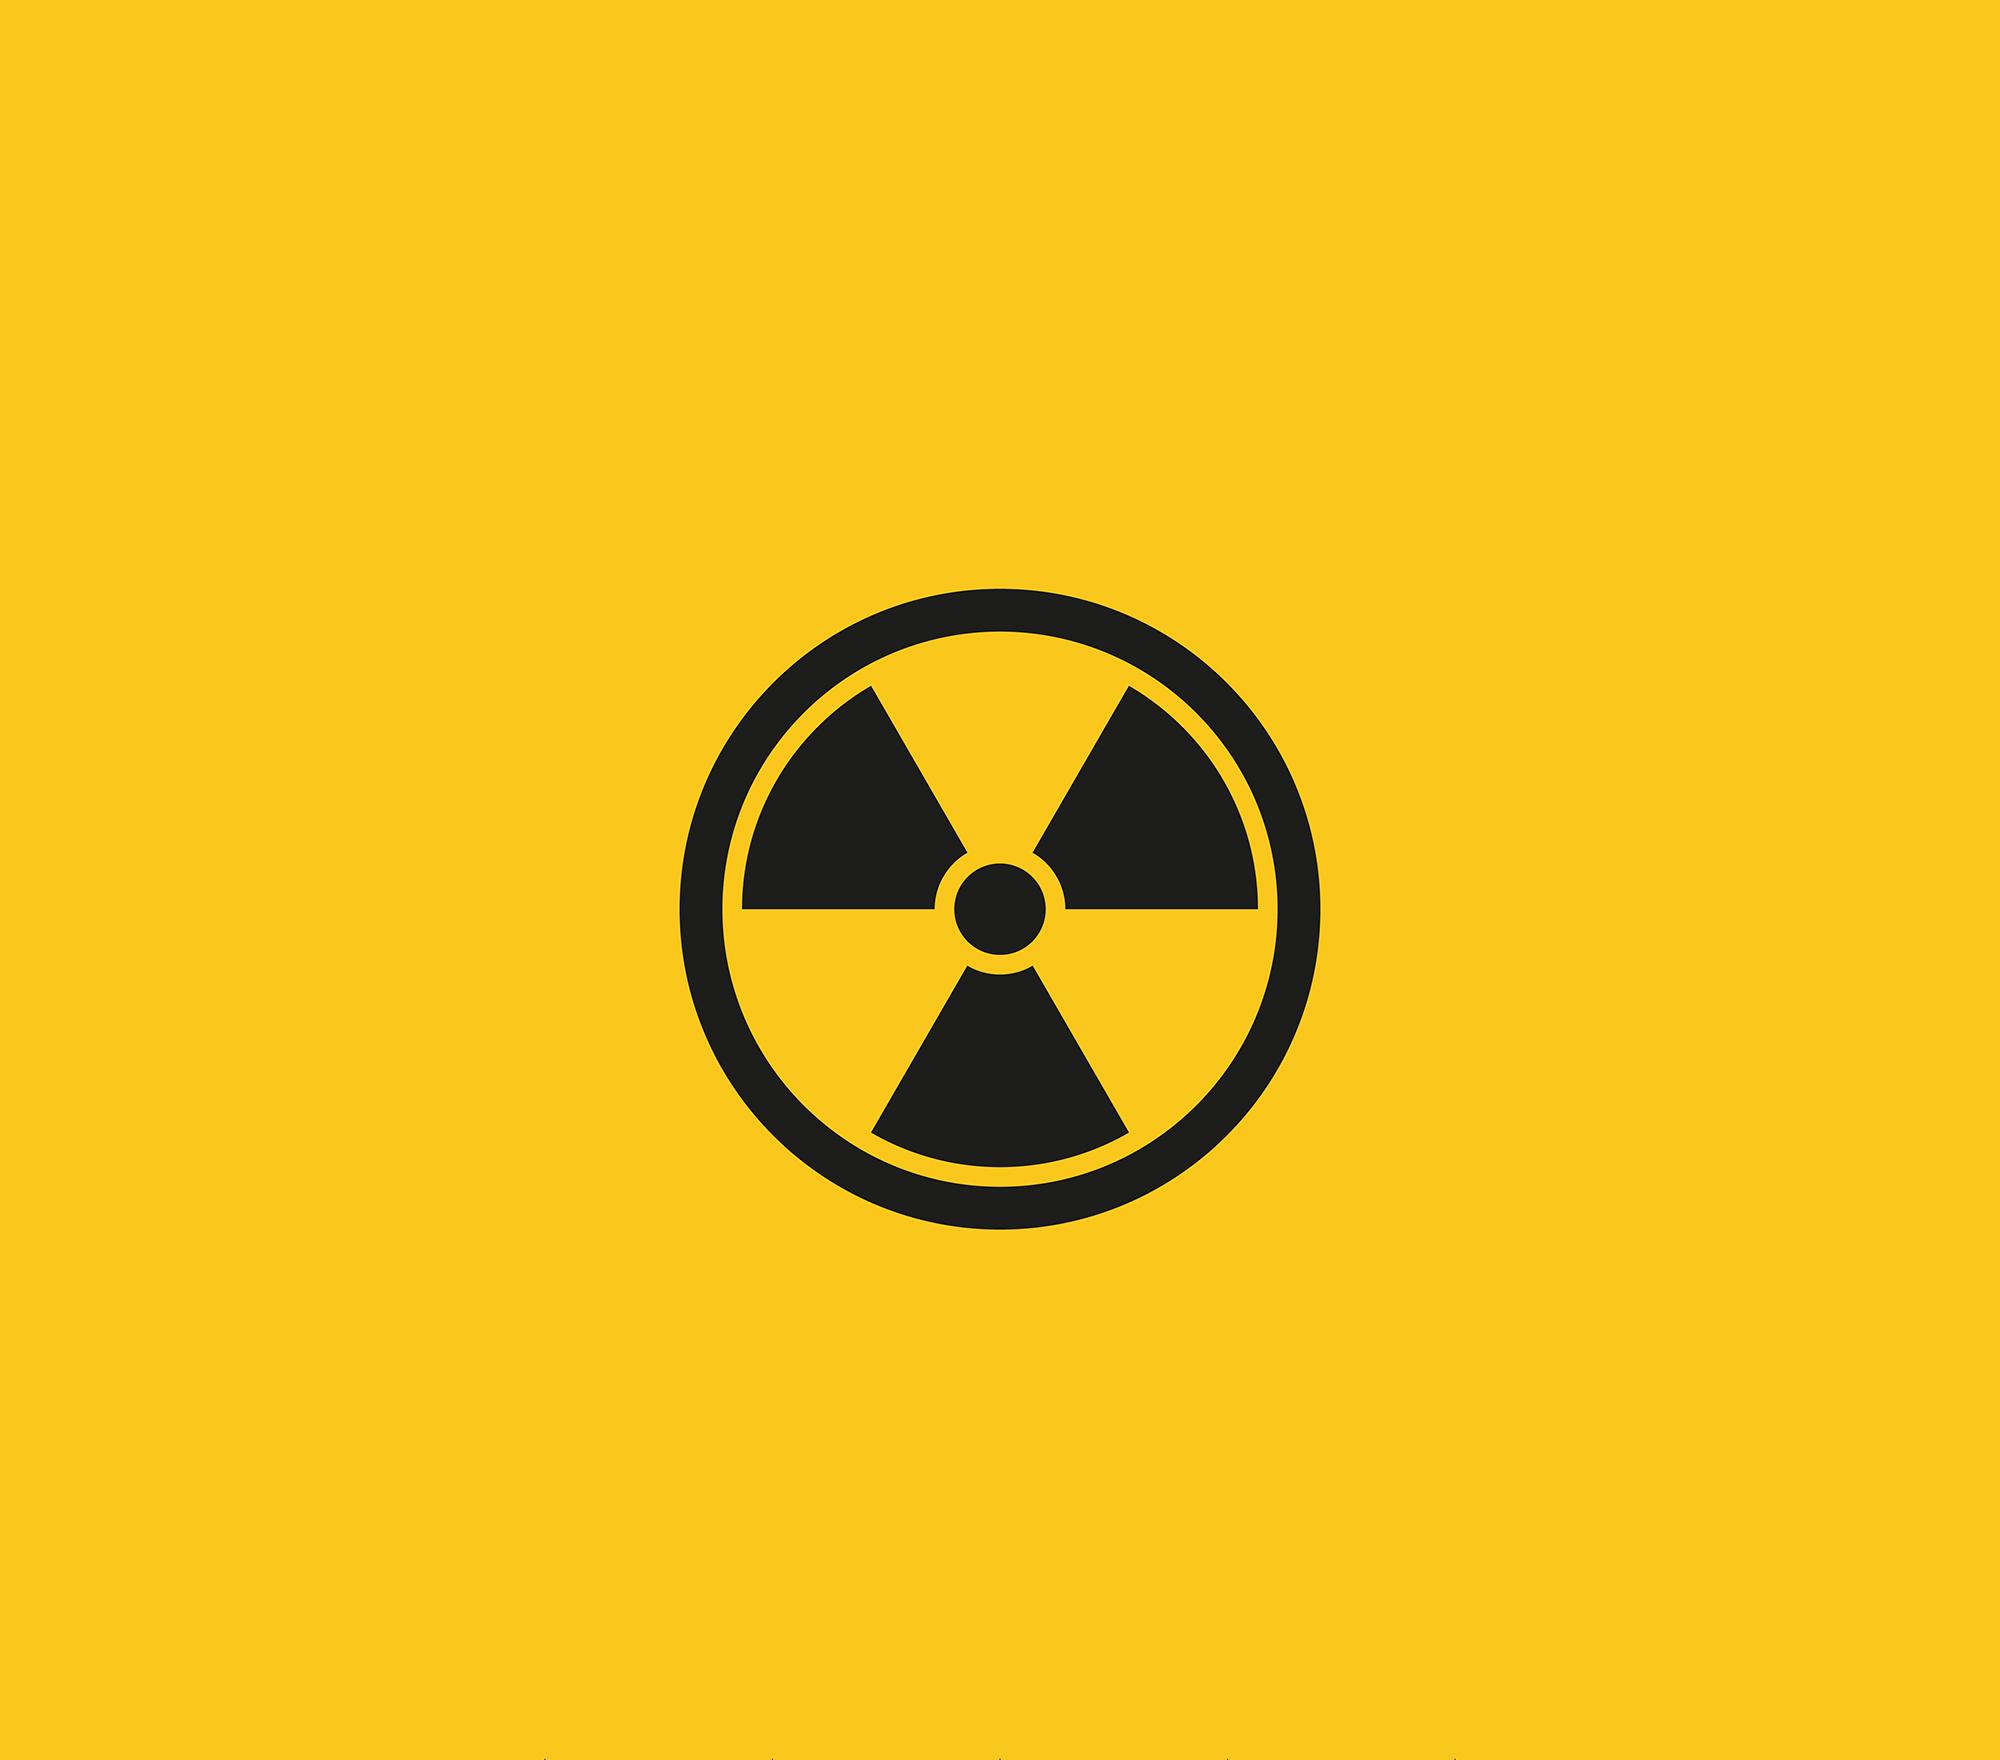 New Ionising Radiation Regulations Irish Dentistry